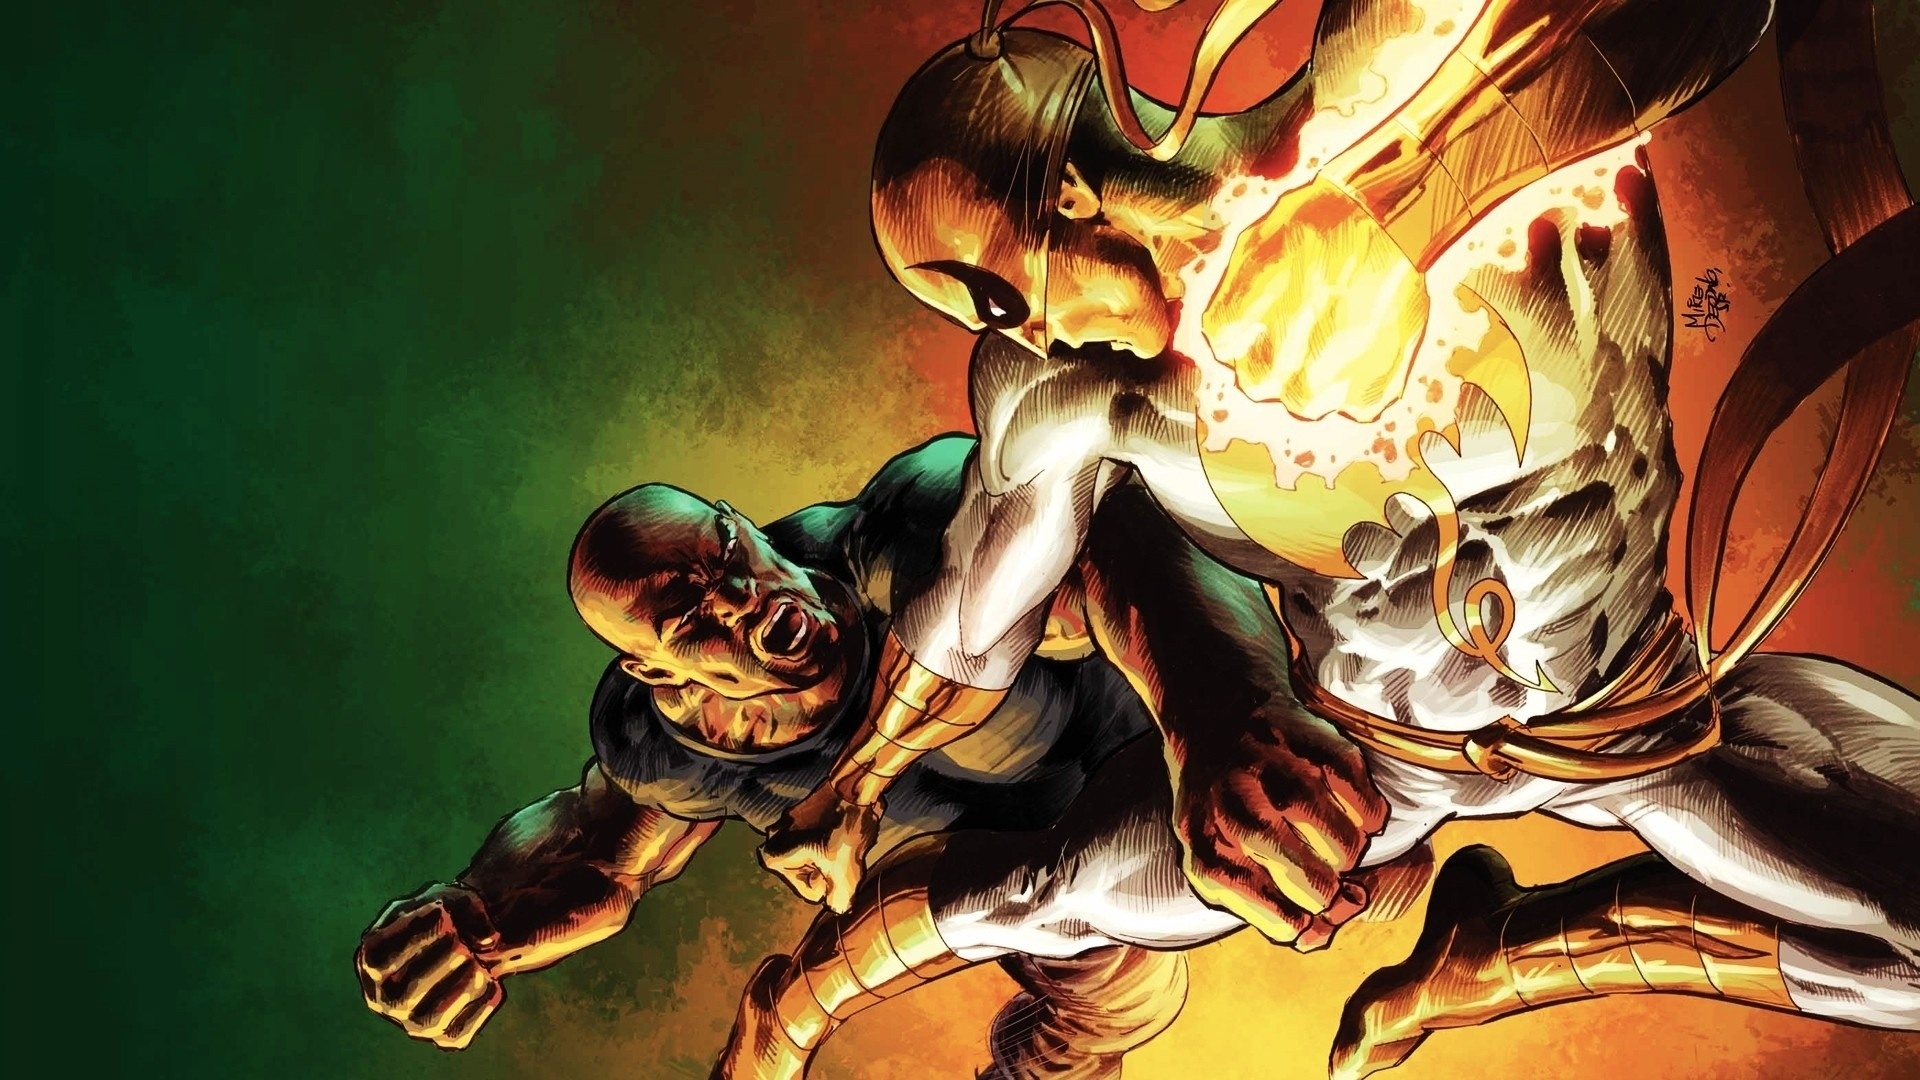 Luke Cage Hd Marvel Wallpaper 1920x1080